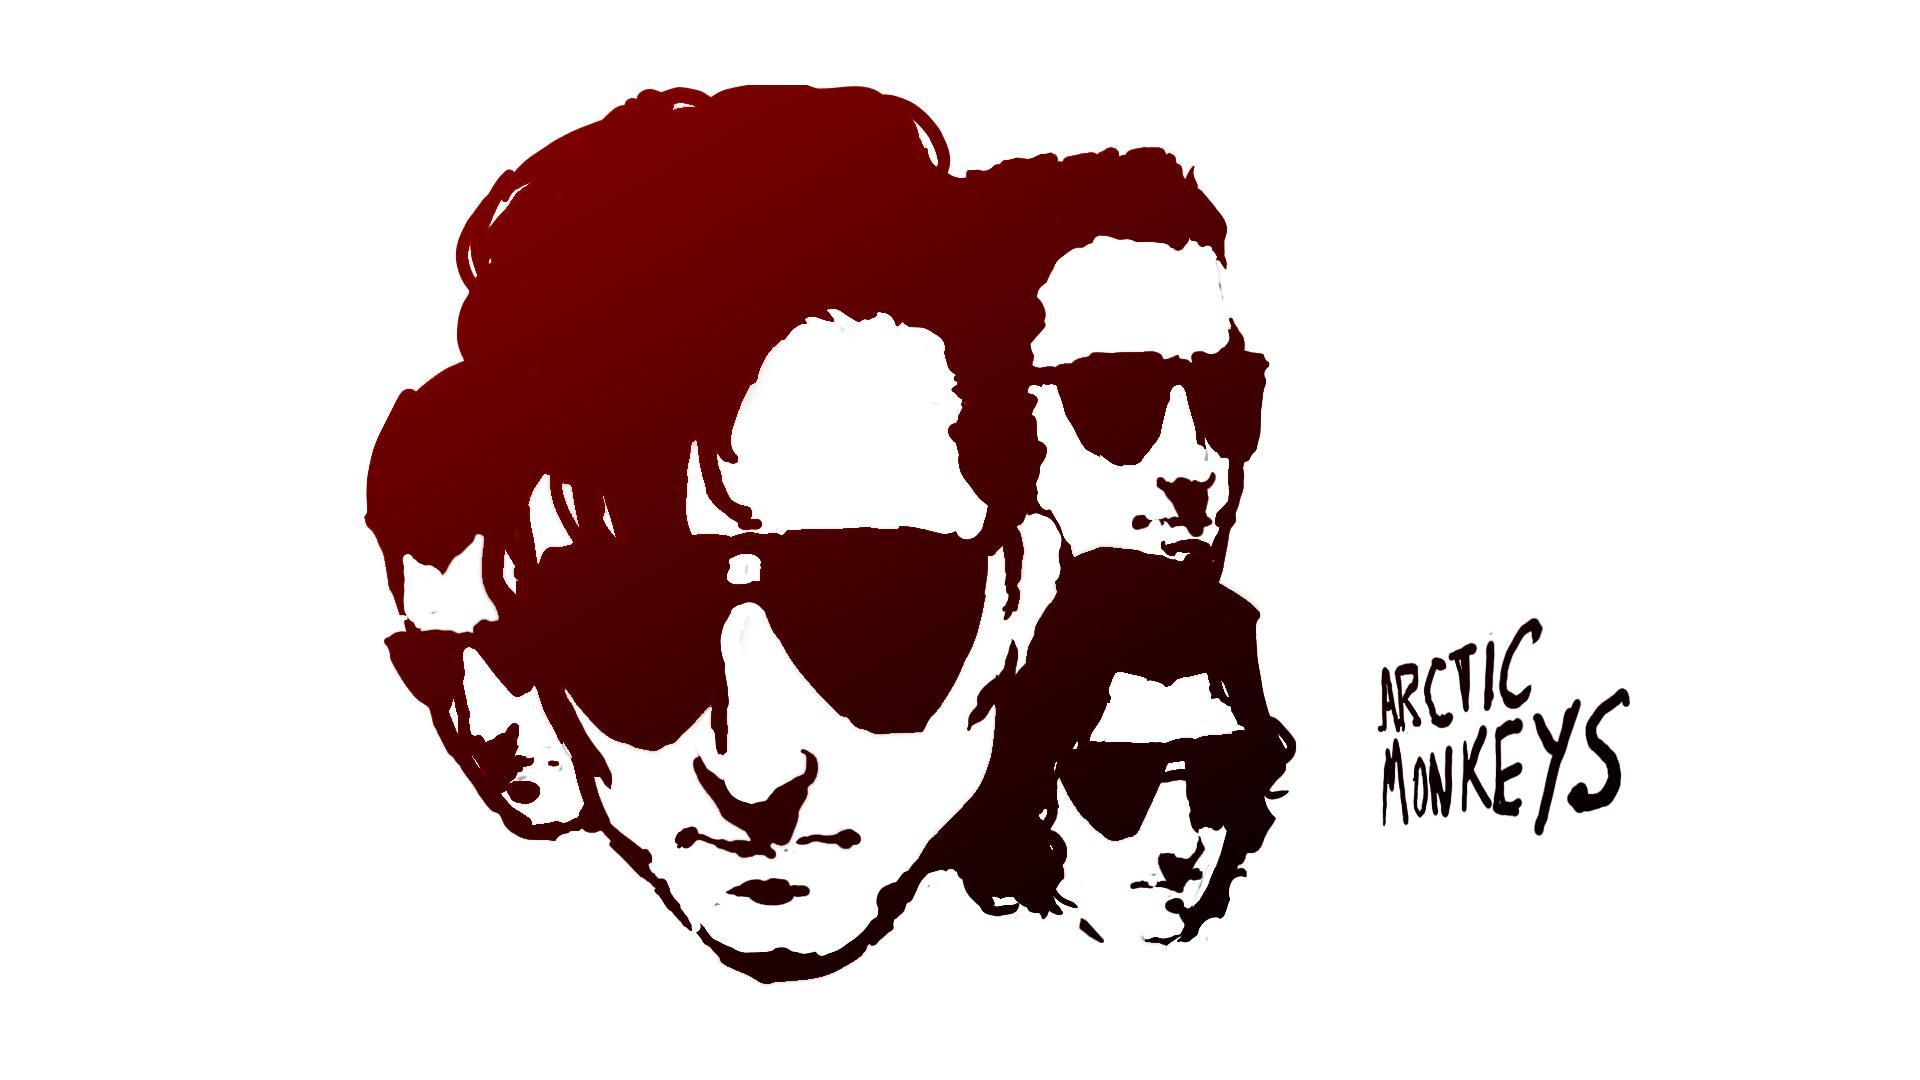 Arctic Monkeys Iphone Clipart.